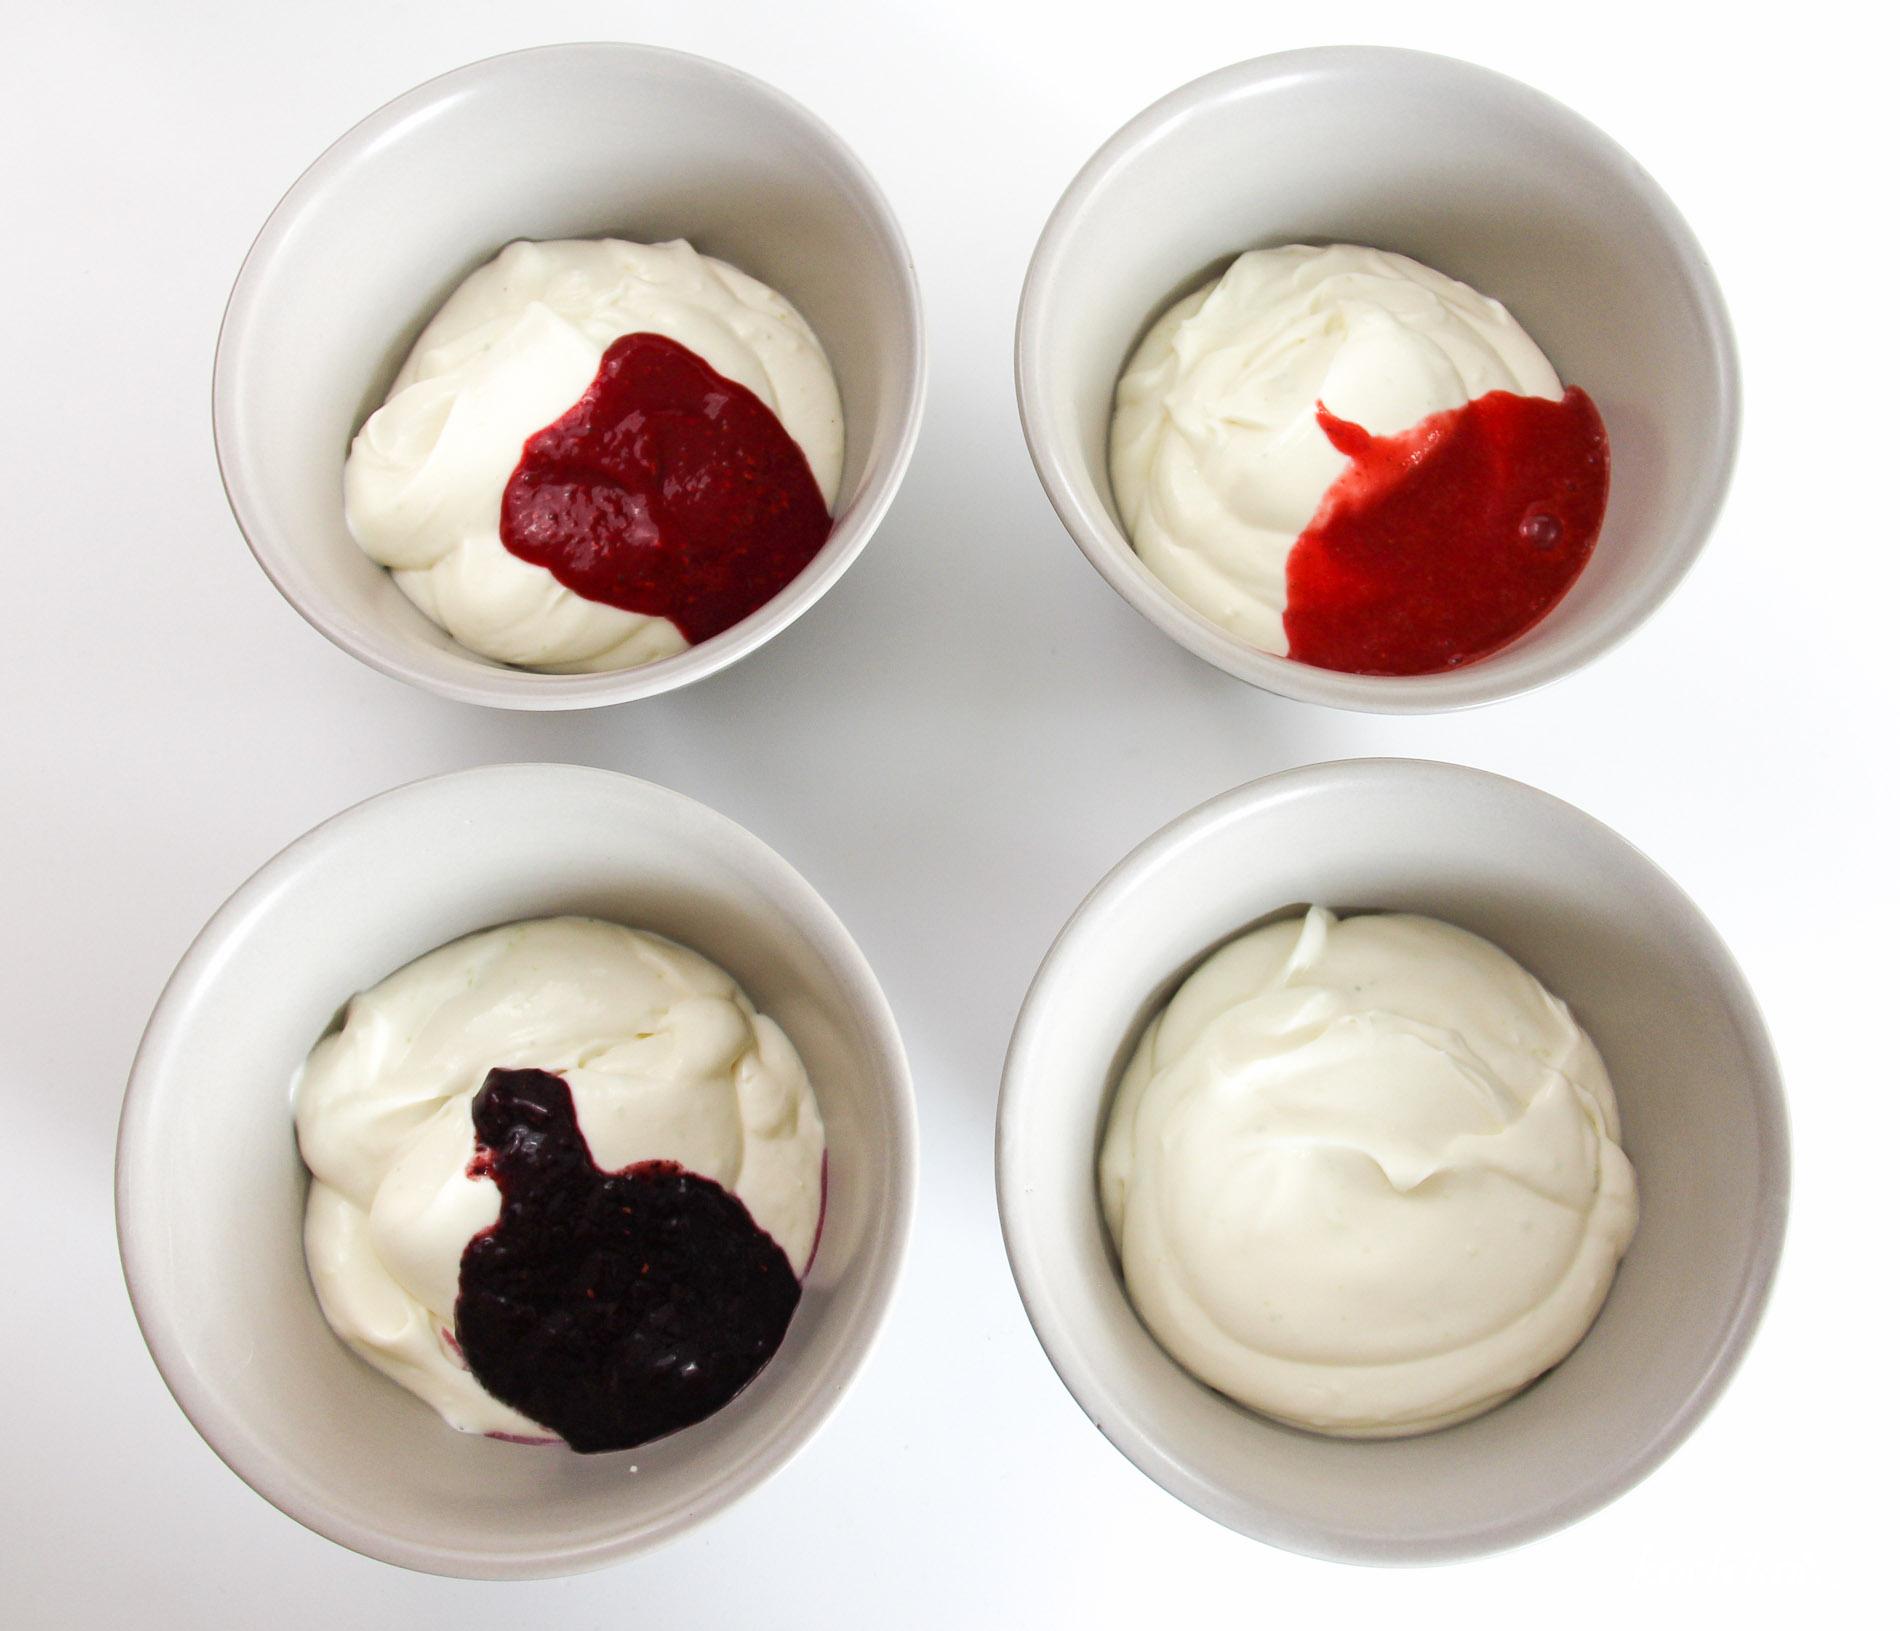 3-pauly-cremeo-torte-naked-cake-no-bake-glutenfrei-laktosefrei-7